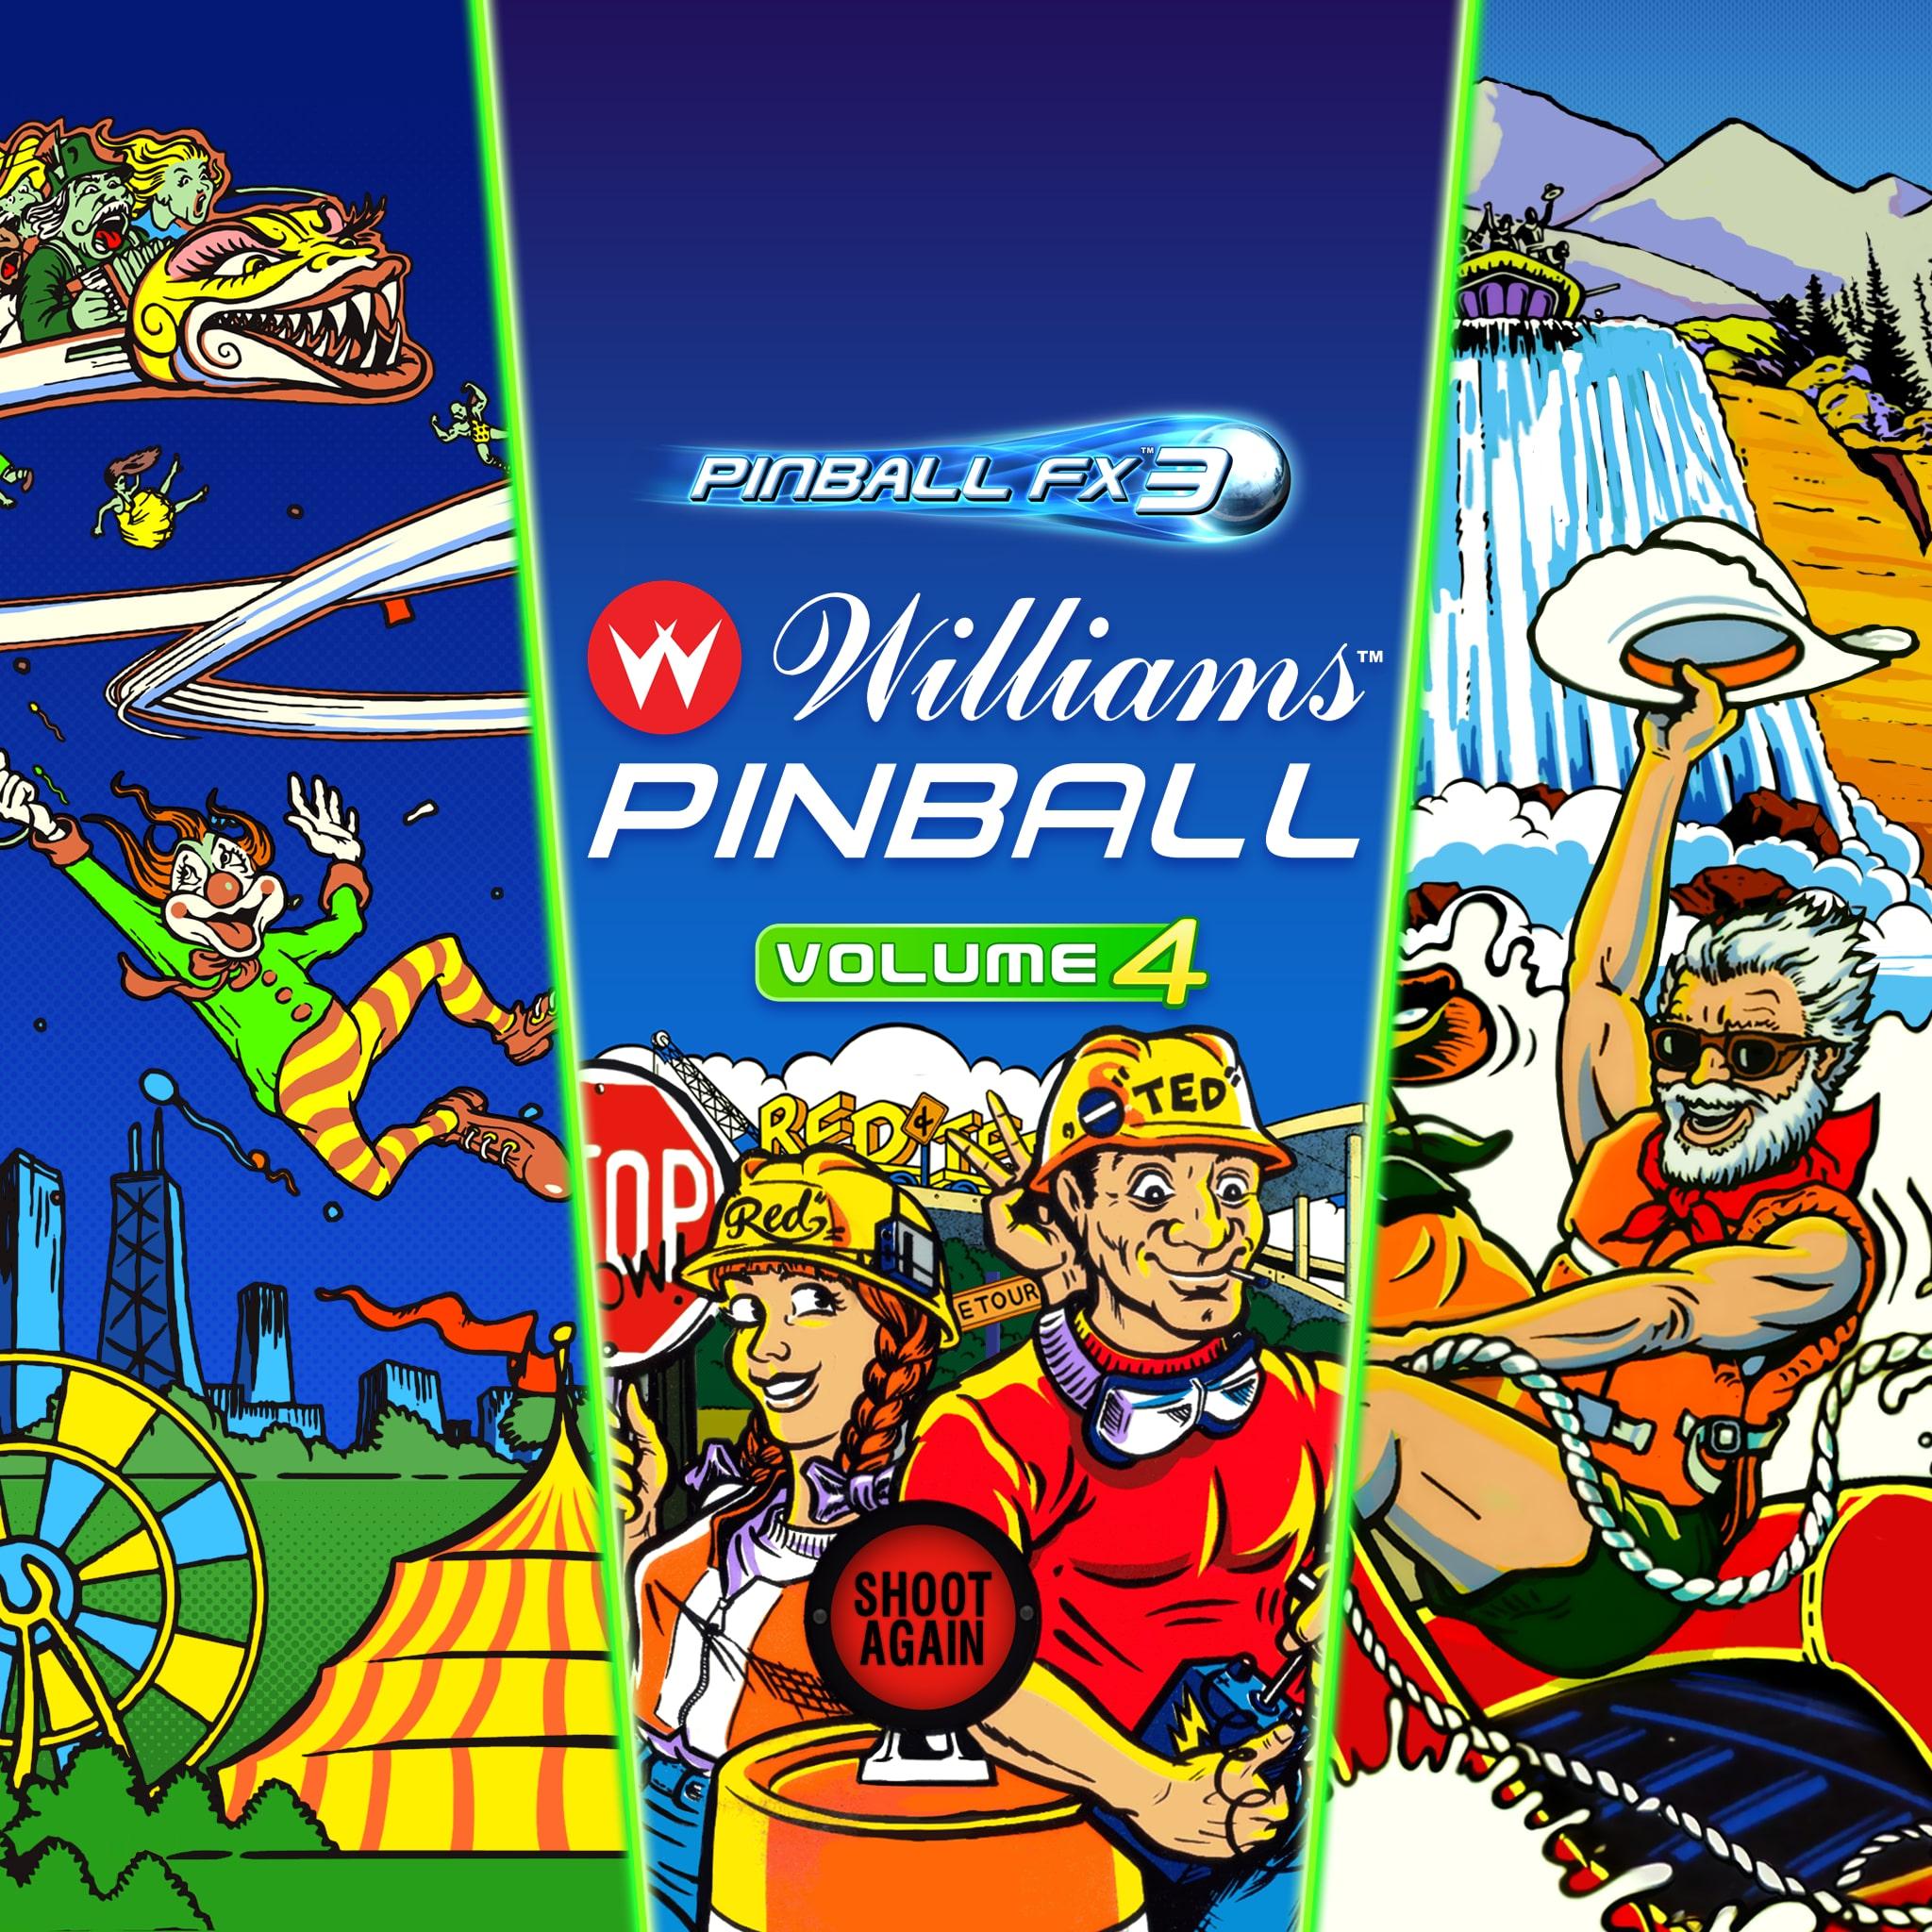 Pinball FX3 -Williams™ Pinball: Volume 4